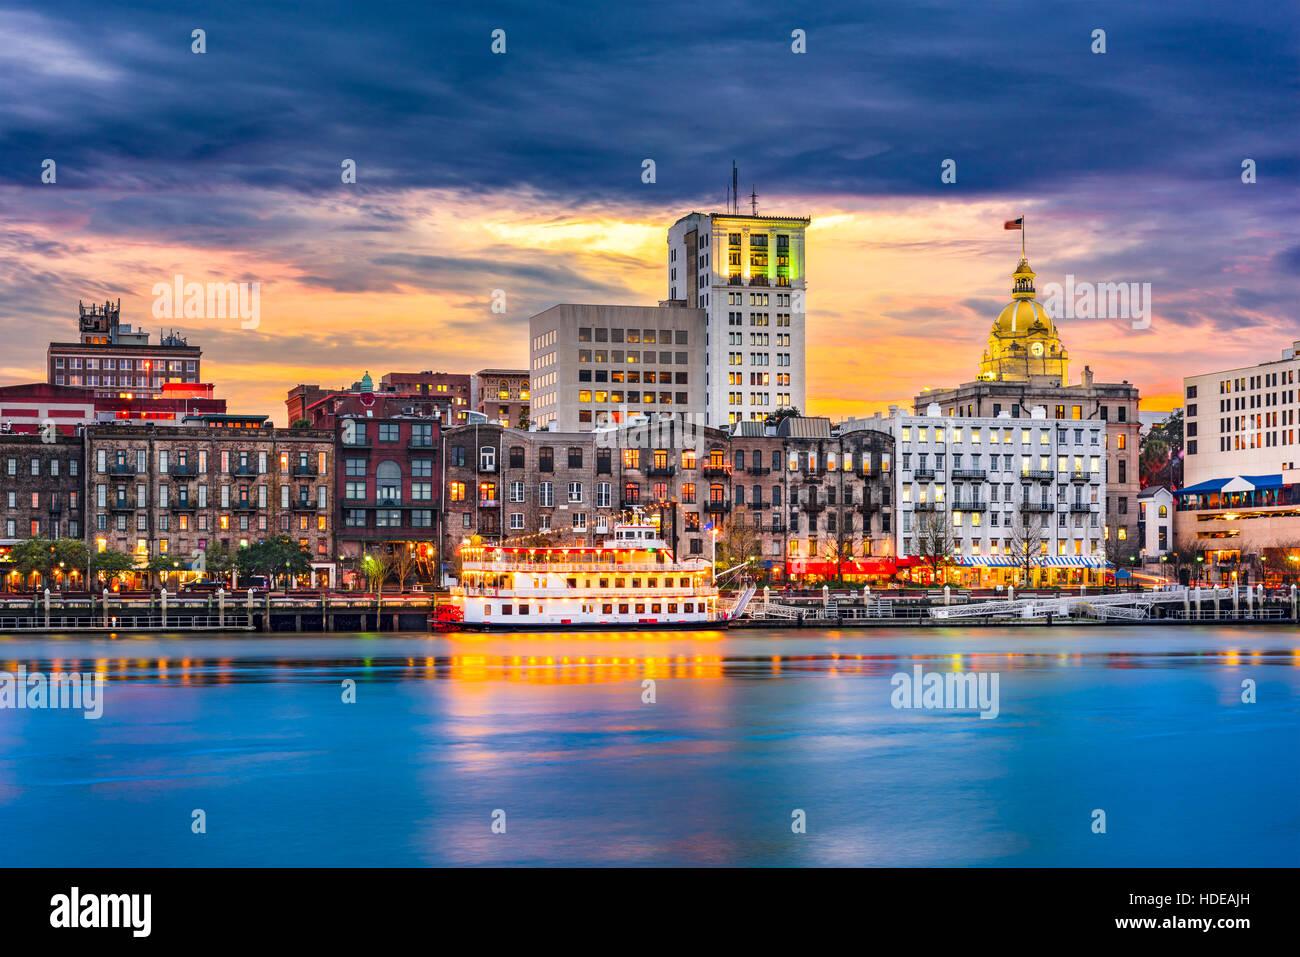 Savannah, Georgia, USA skyline on the Savannah River at dusk. - Stock Image